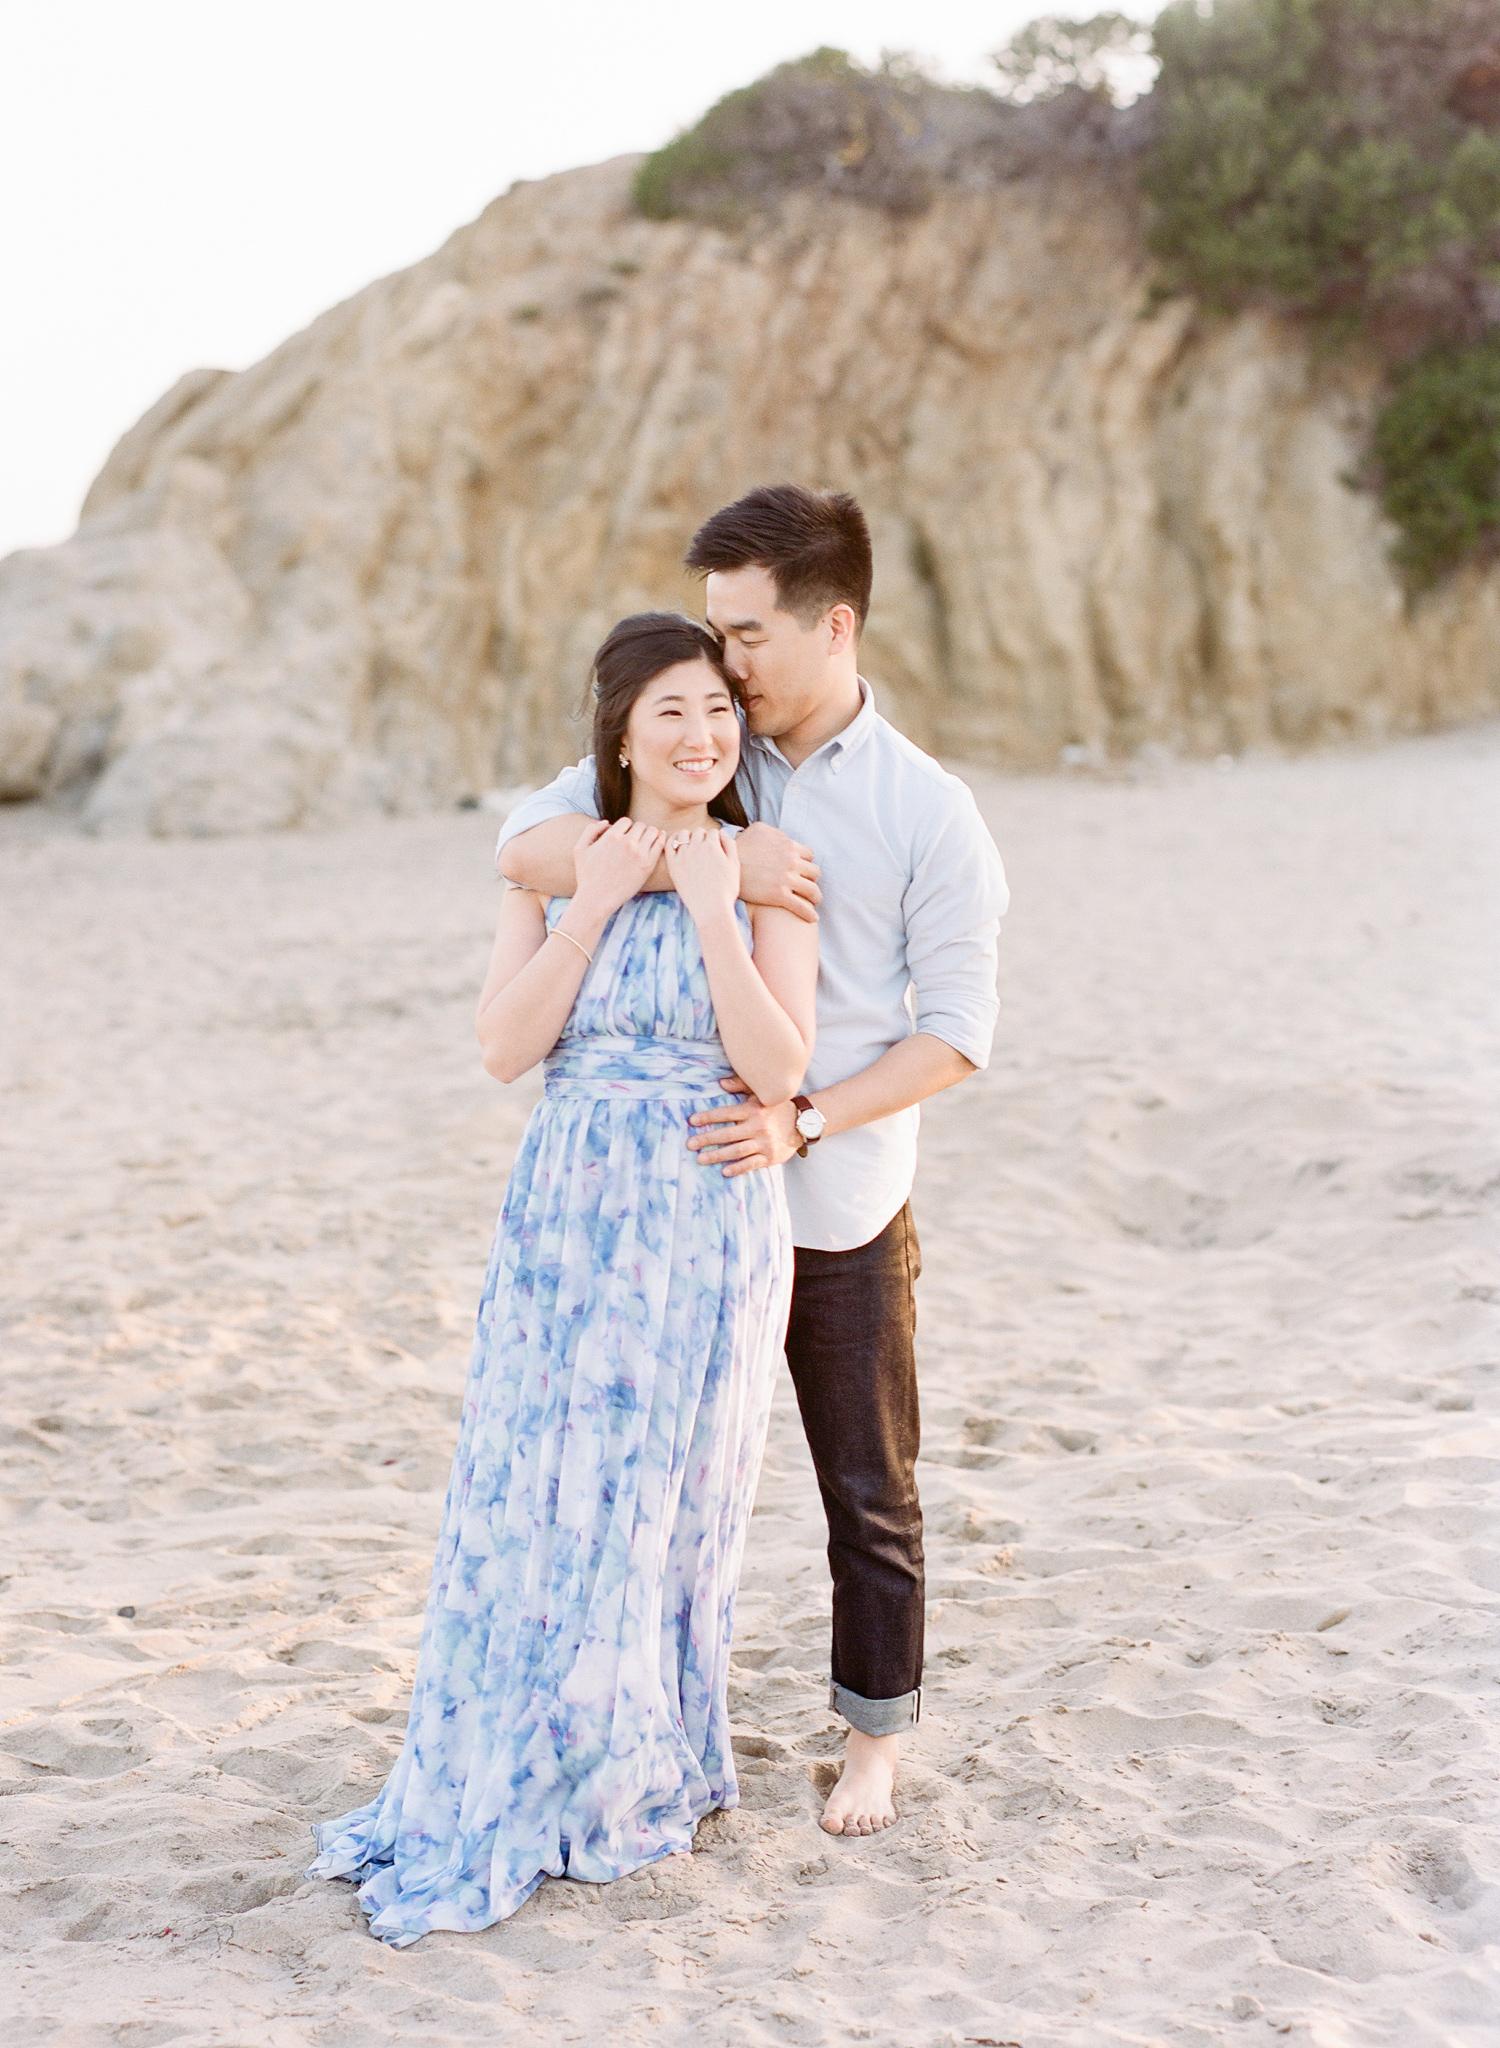 046-Jen-Wojcik-Photography-San-Diego-Wedding-Photographer.jpg